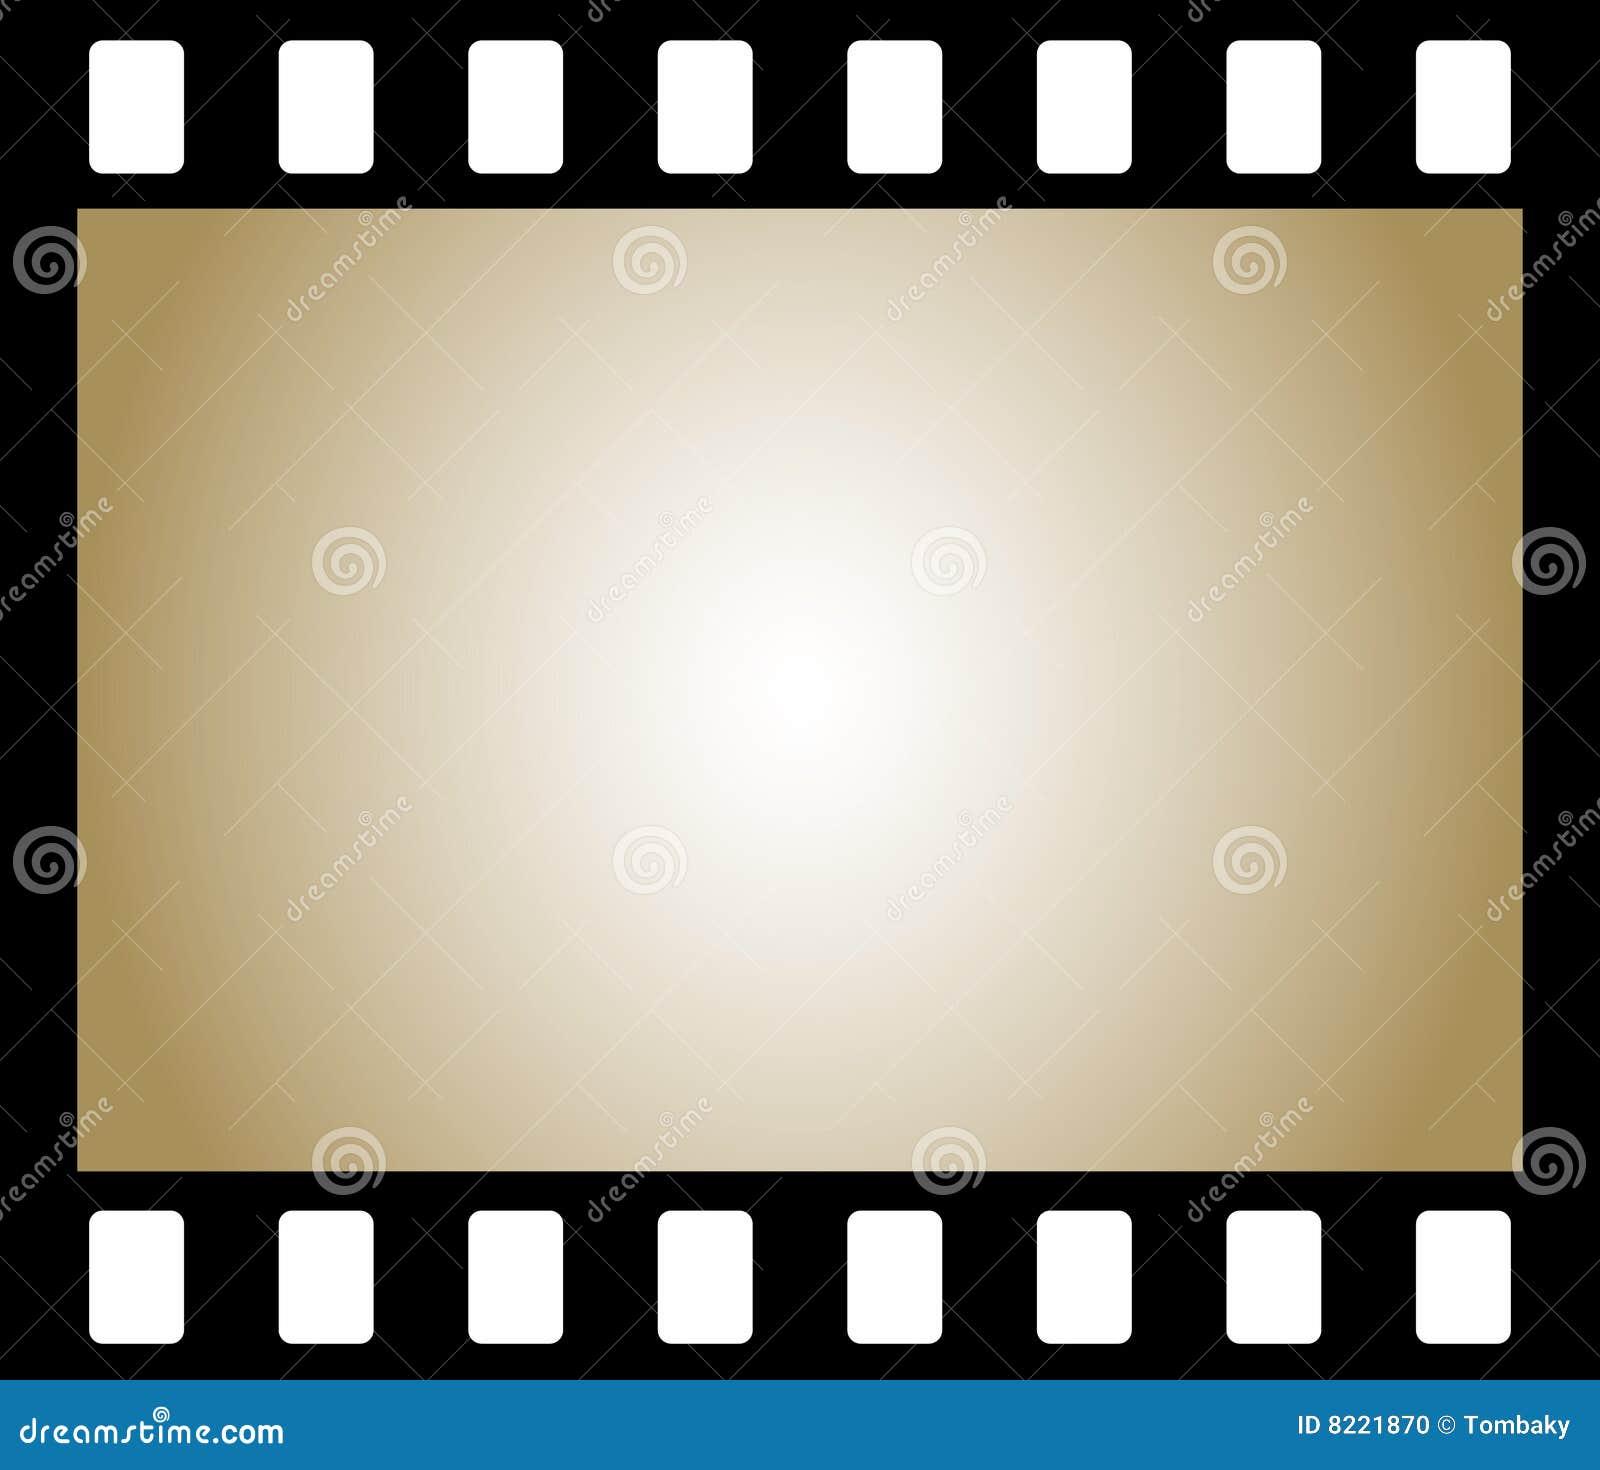 Old Negative Photo Film Stock Photo - Image: 8221870